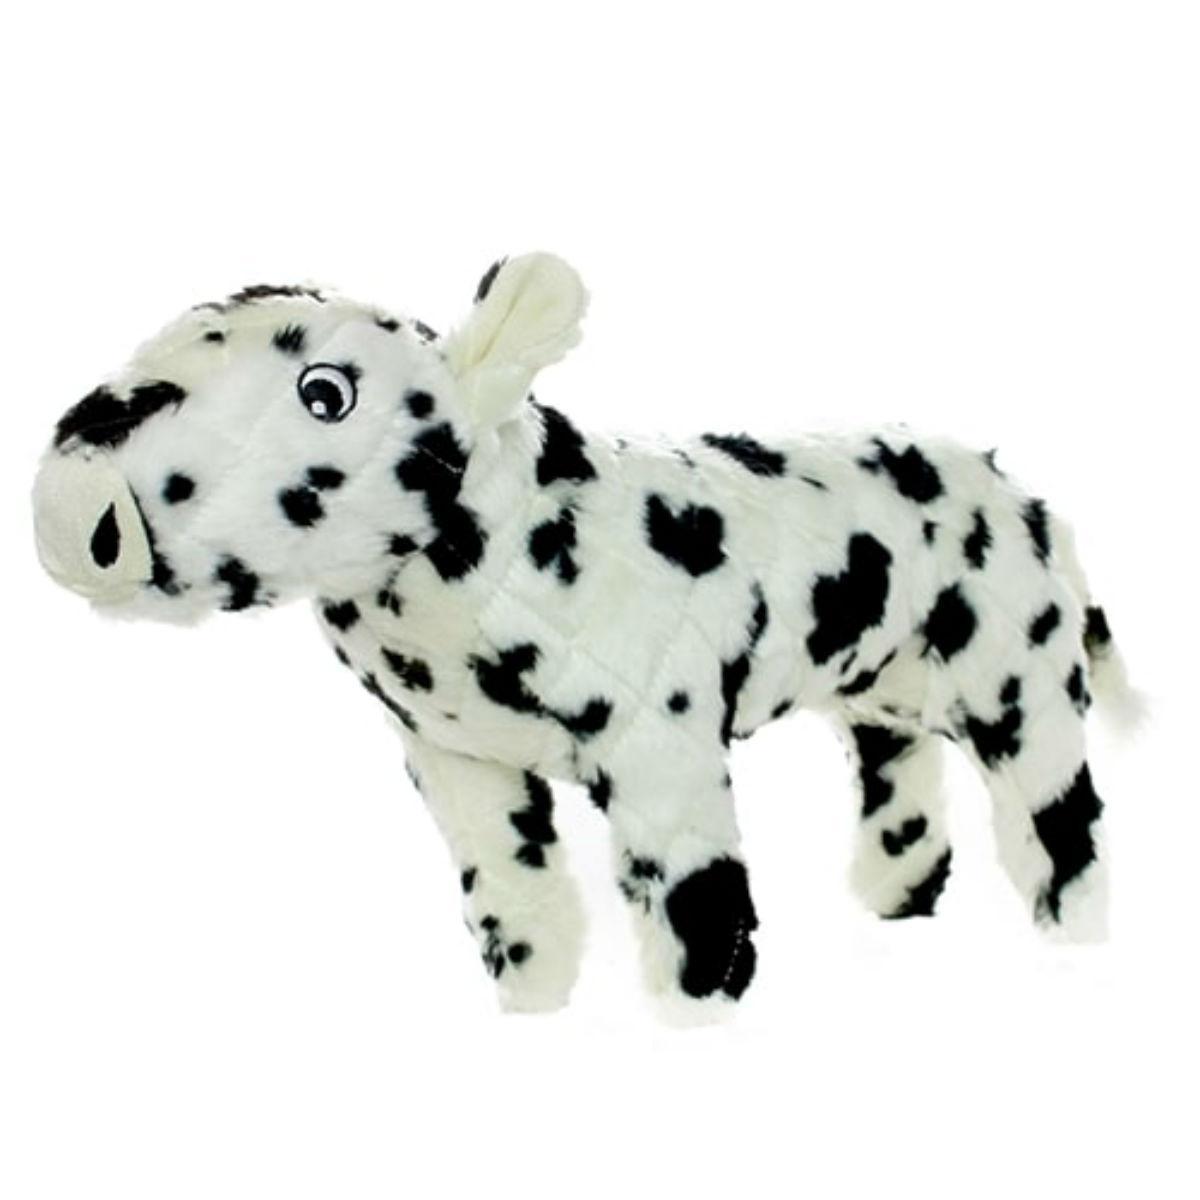 Mighty Farm Series Dog Toy - Cassie Cow